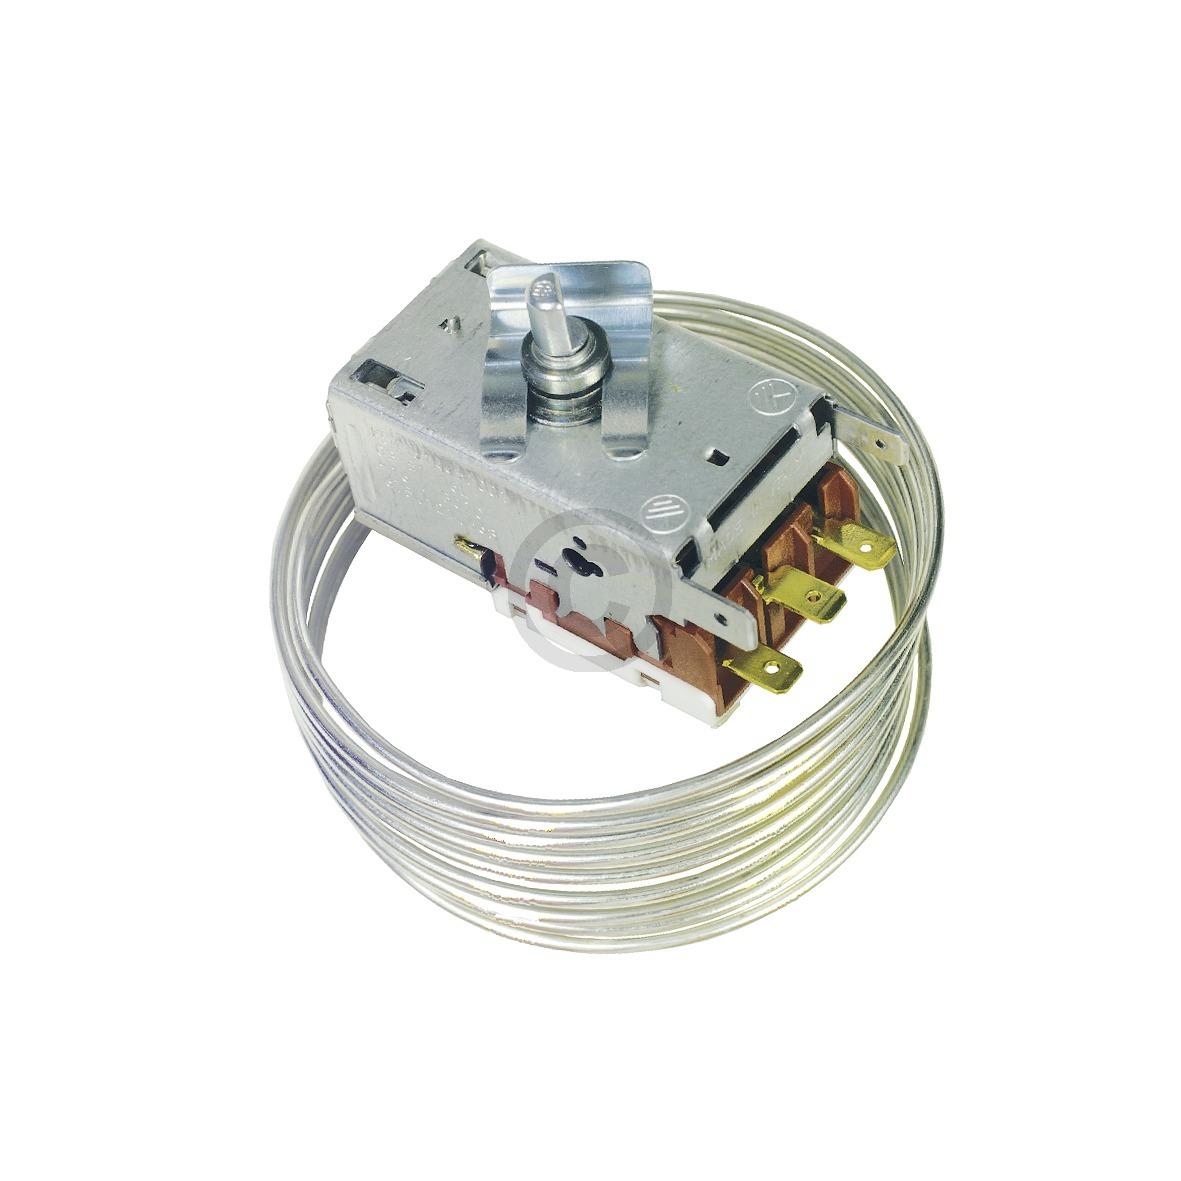 Thermostat K54-H1445 Ranco, OT! 899675121663 AEG, Electrolux, Juno, Zanussi